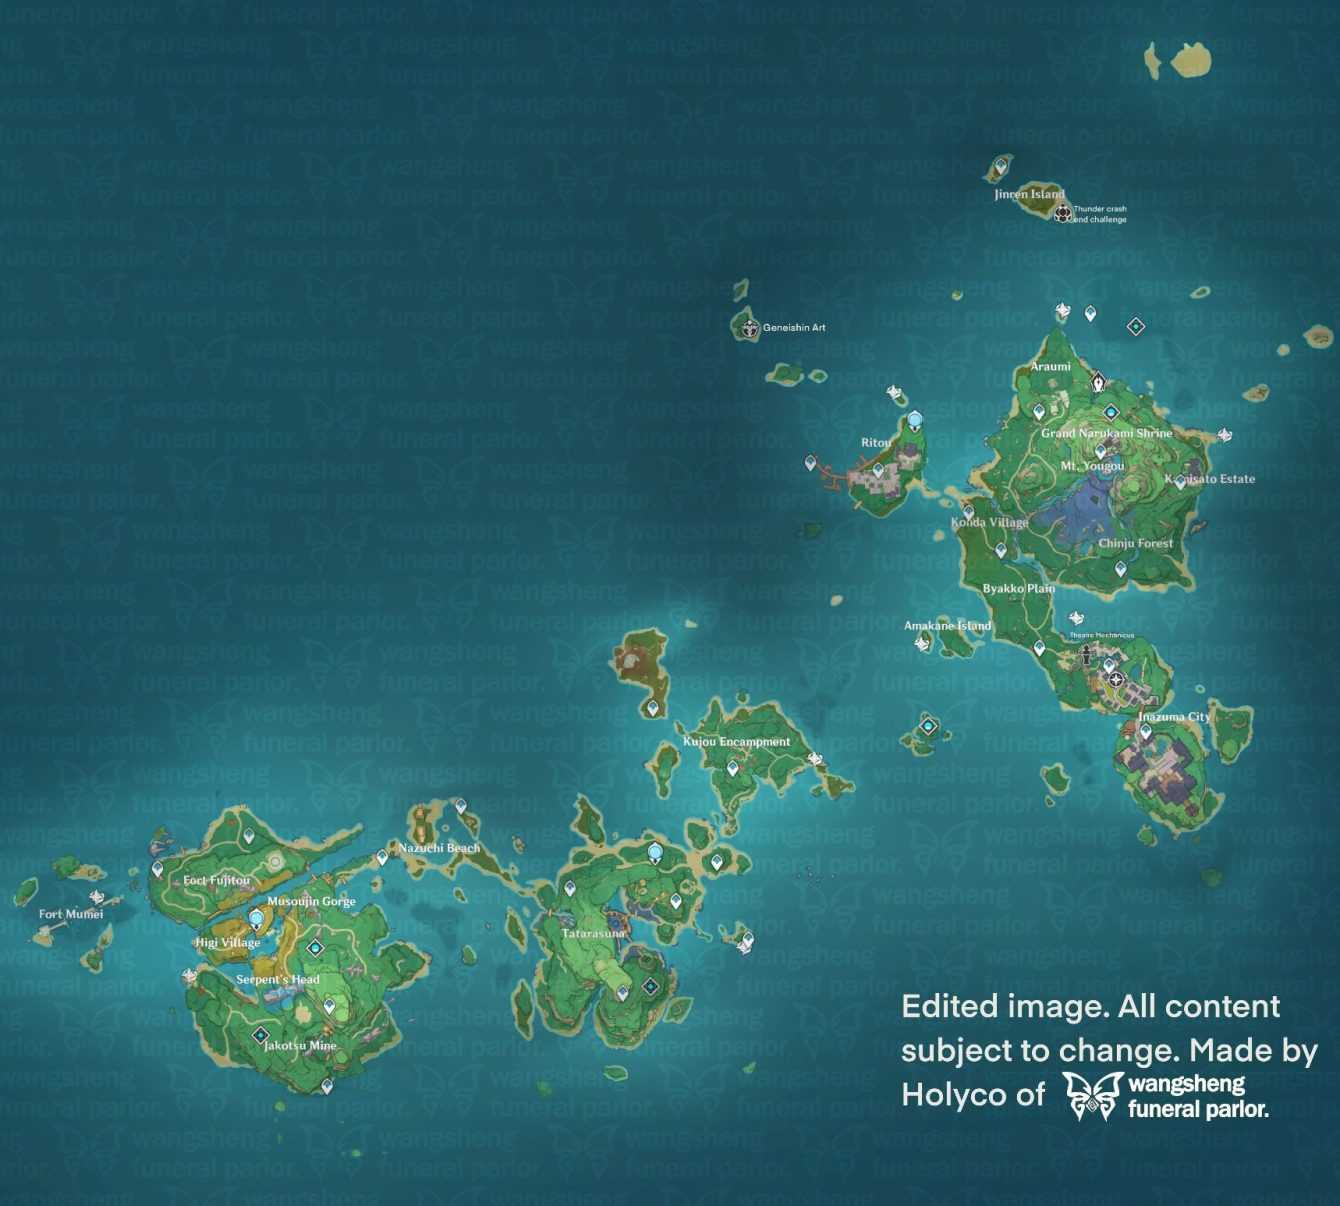 Genshin Impact: a new leak reveals the Inazuma region